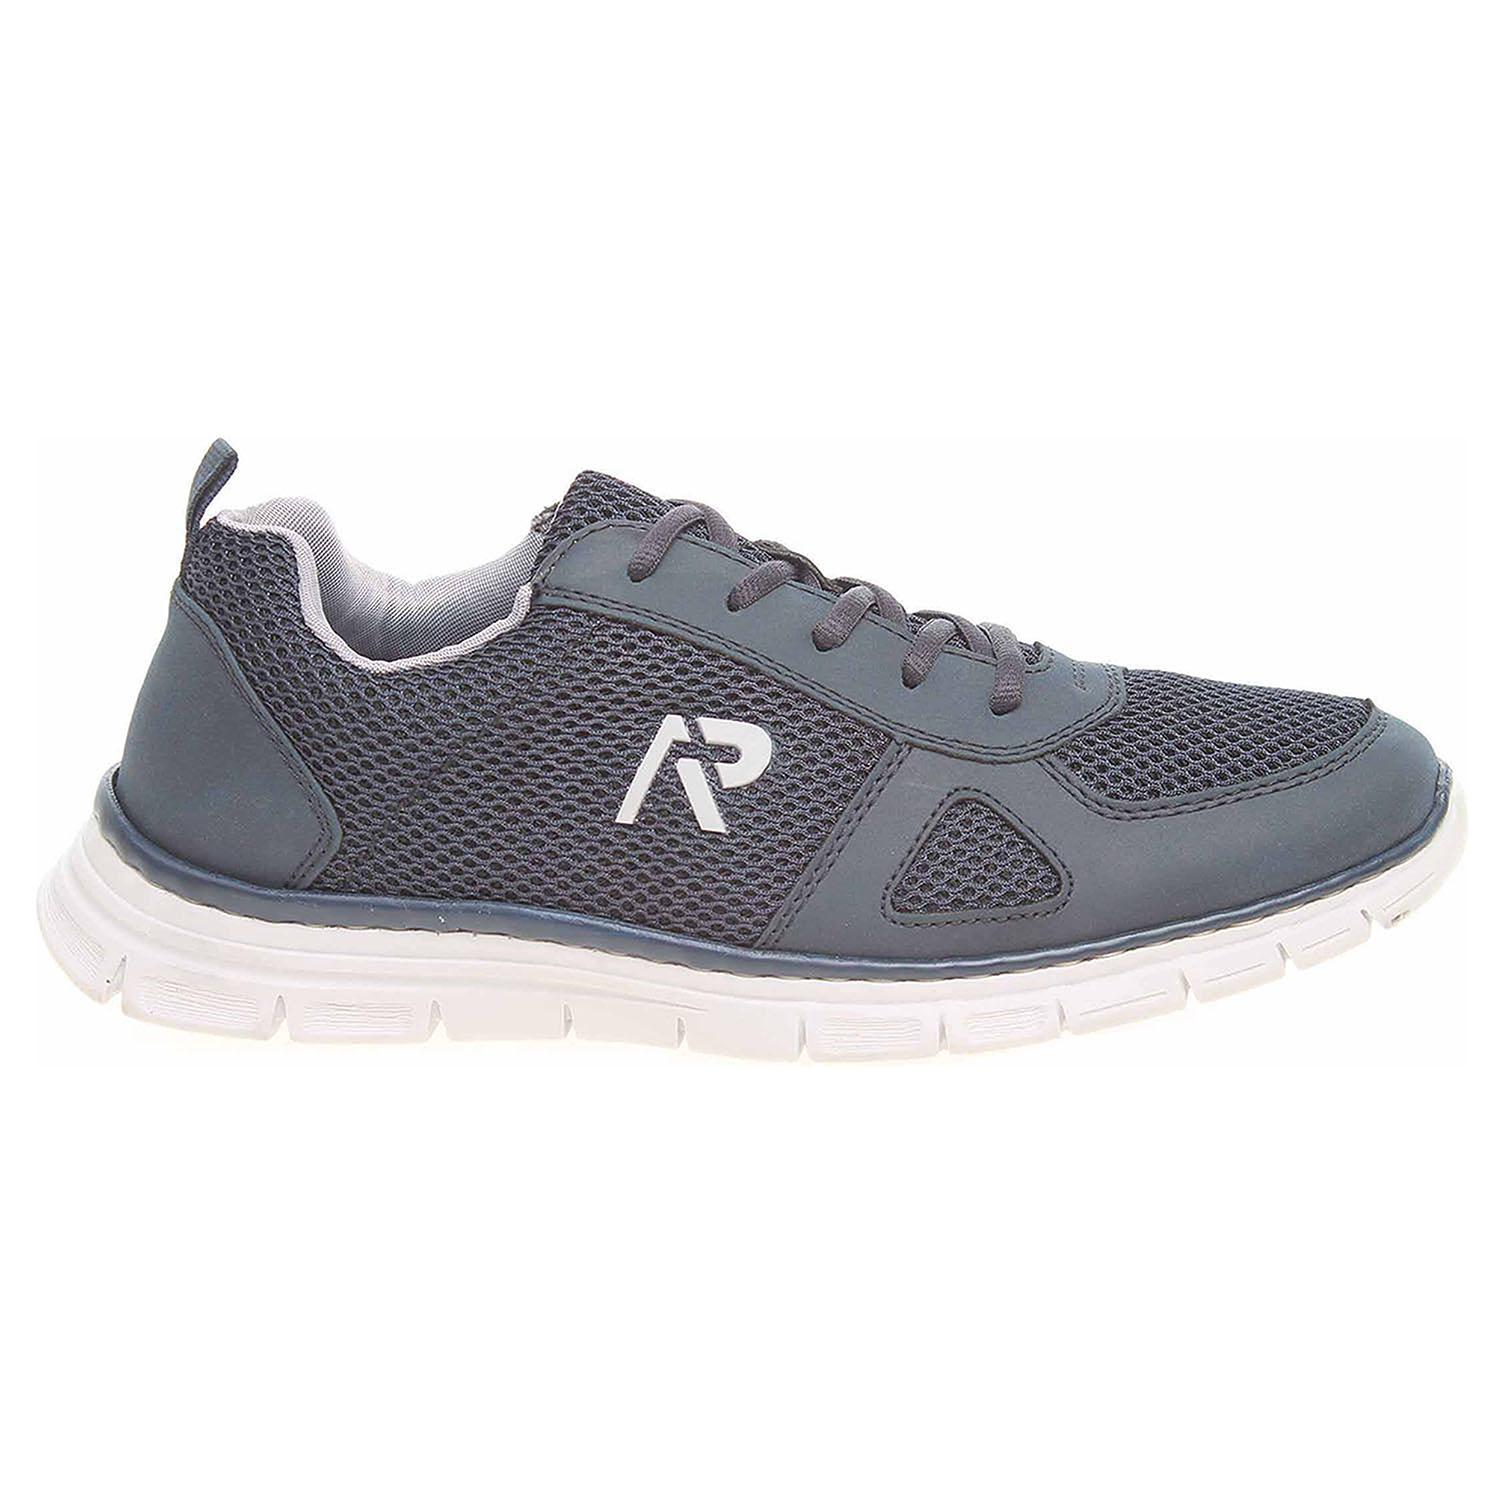 Rieker pánská obuv B4812-14 blau B4812-14 47